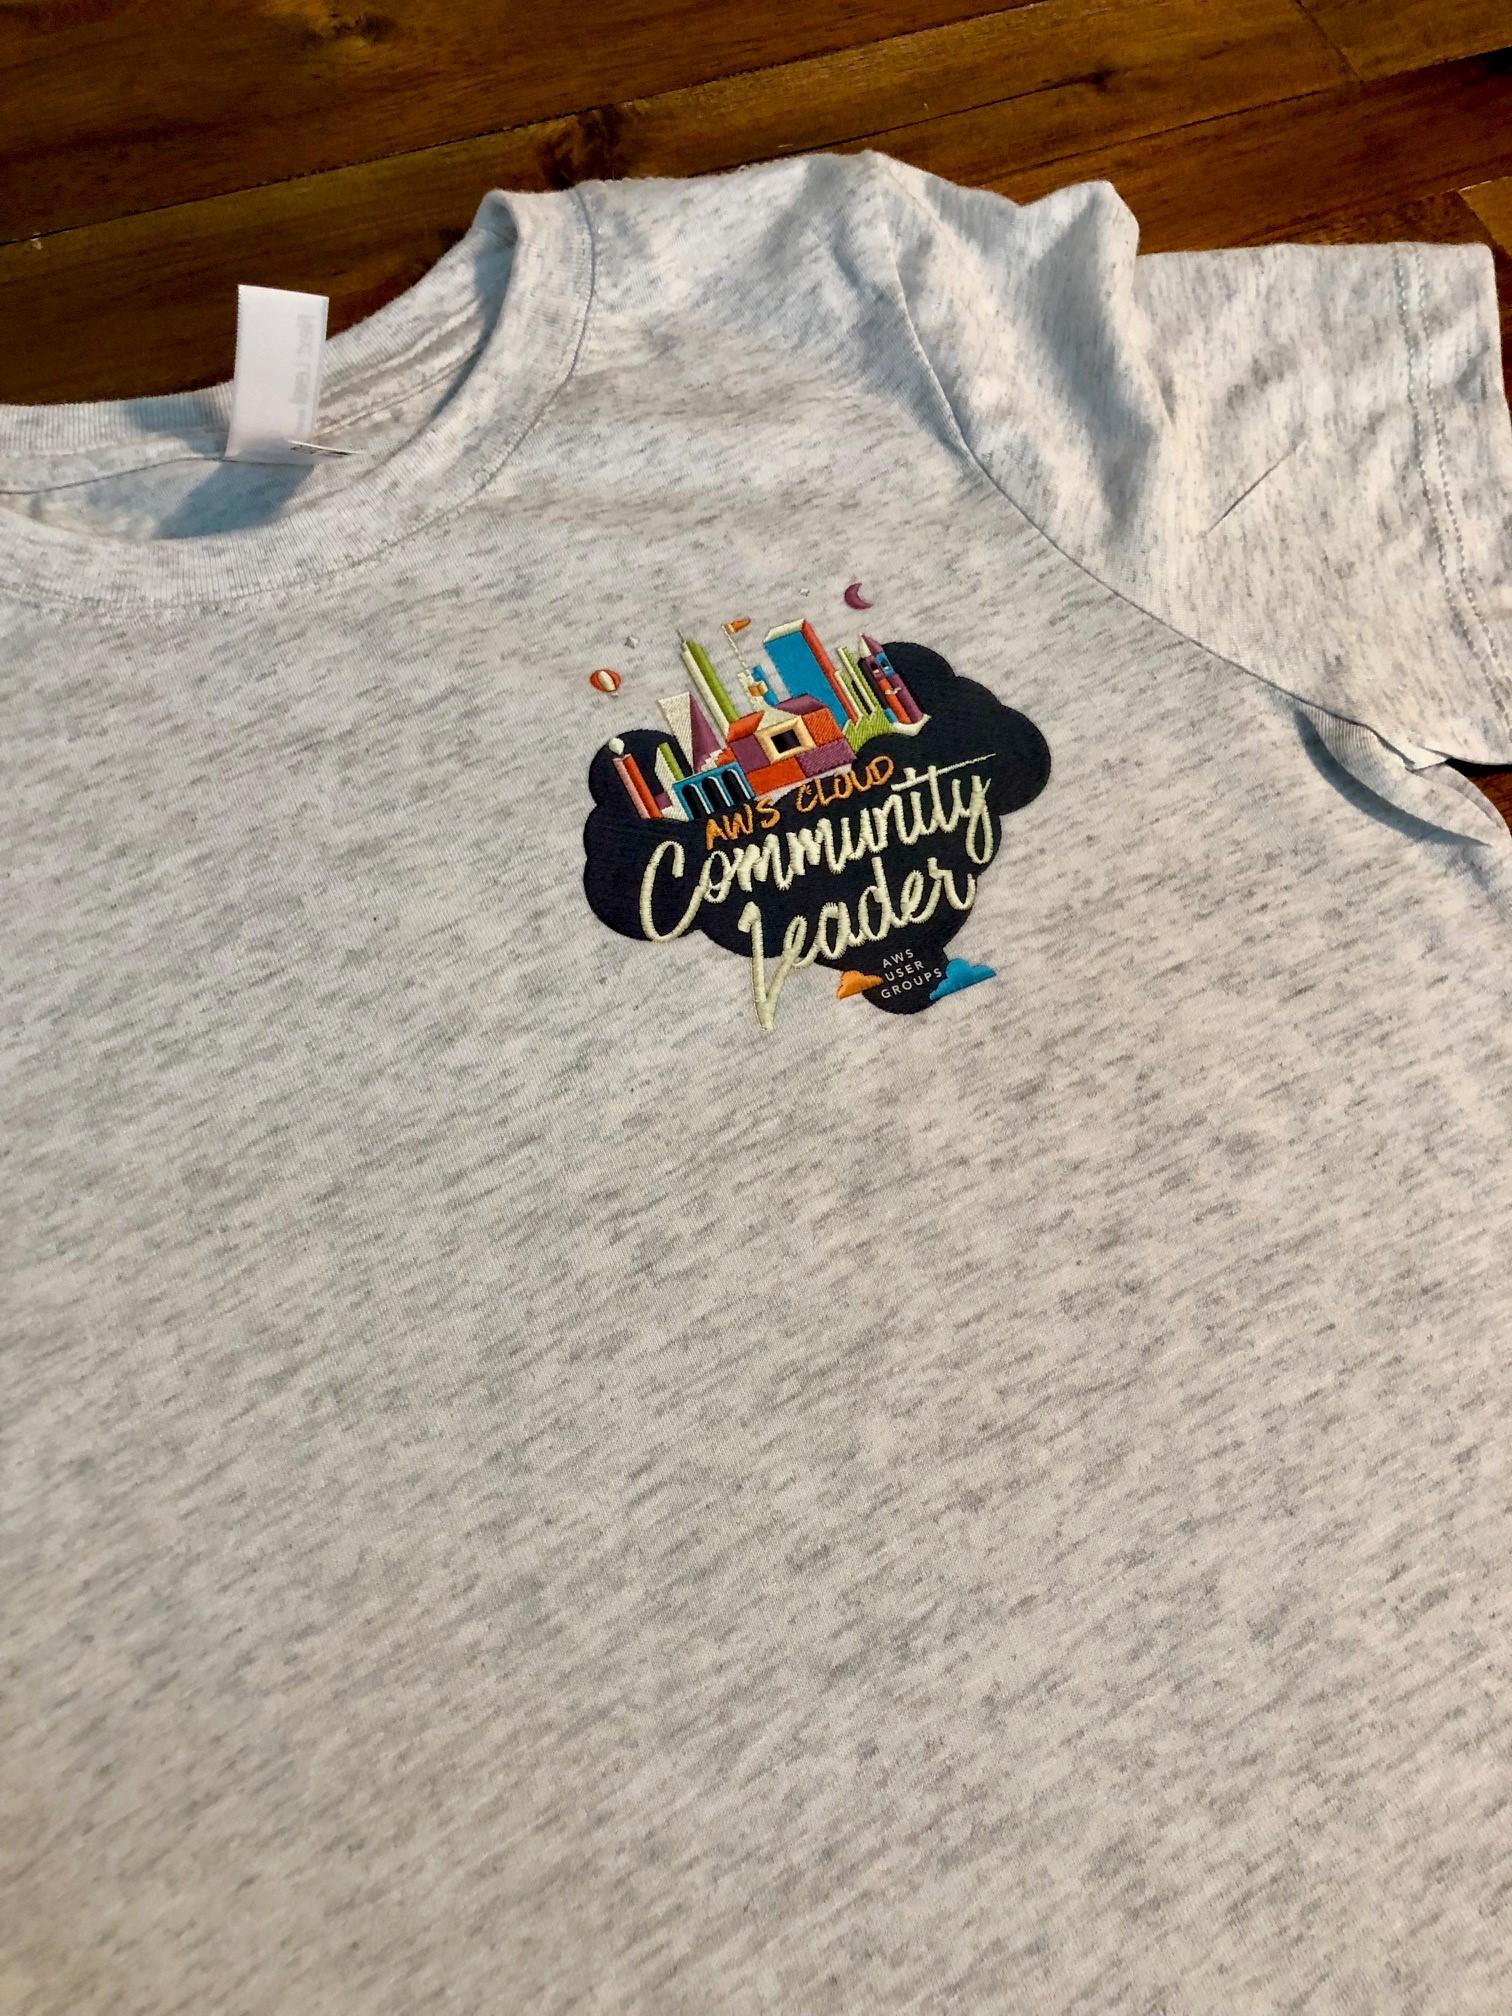 logounltd_laser_etching_embroidery_screen_printing_apparel_uniform_custom_tshirts_dye_sublimation_kirkland_bellevue_seattle_redmond_branded_merchandise_promotional_products_logo_unltd_amazon_aws_tshirt_patches (3).jpg